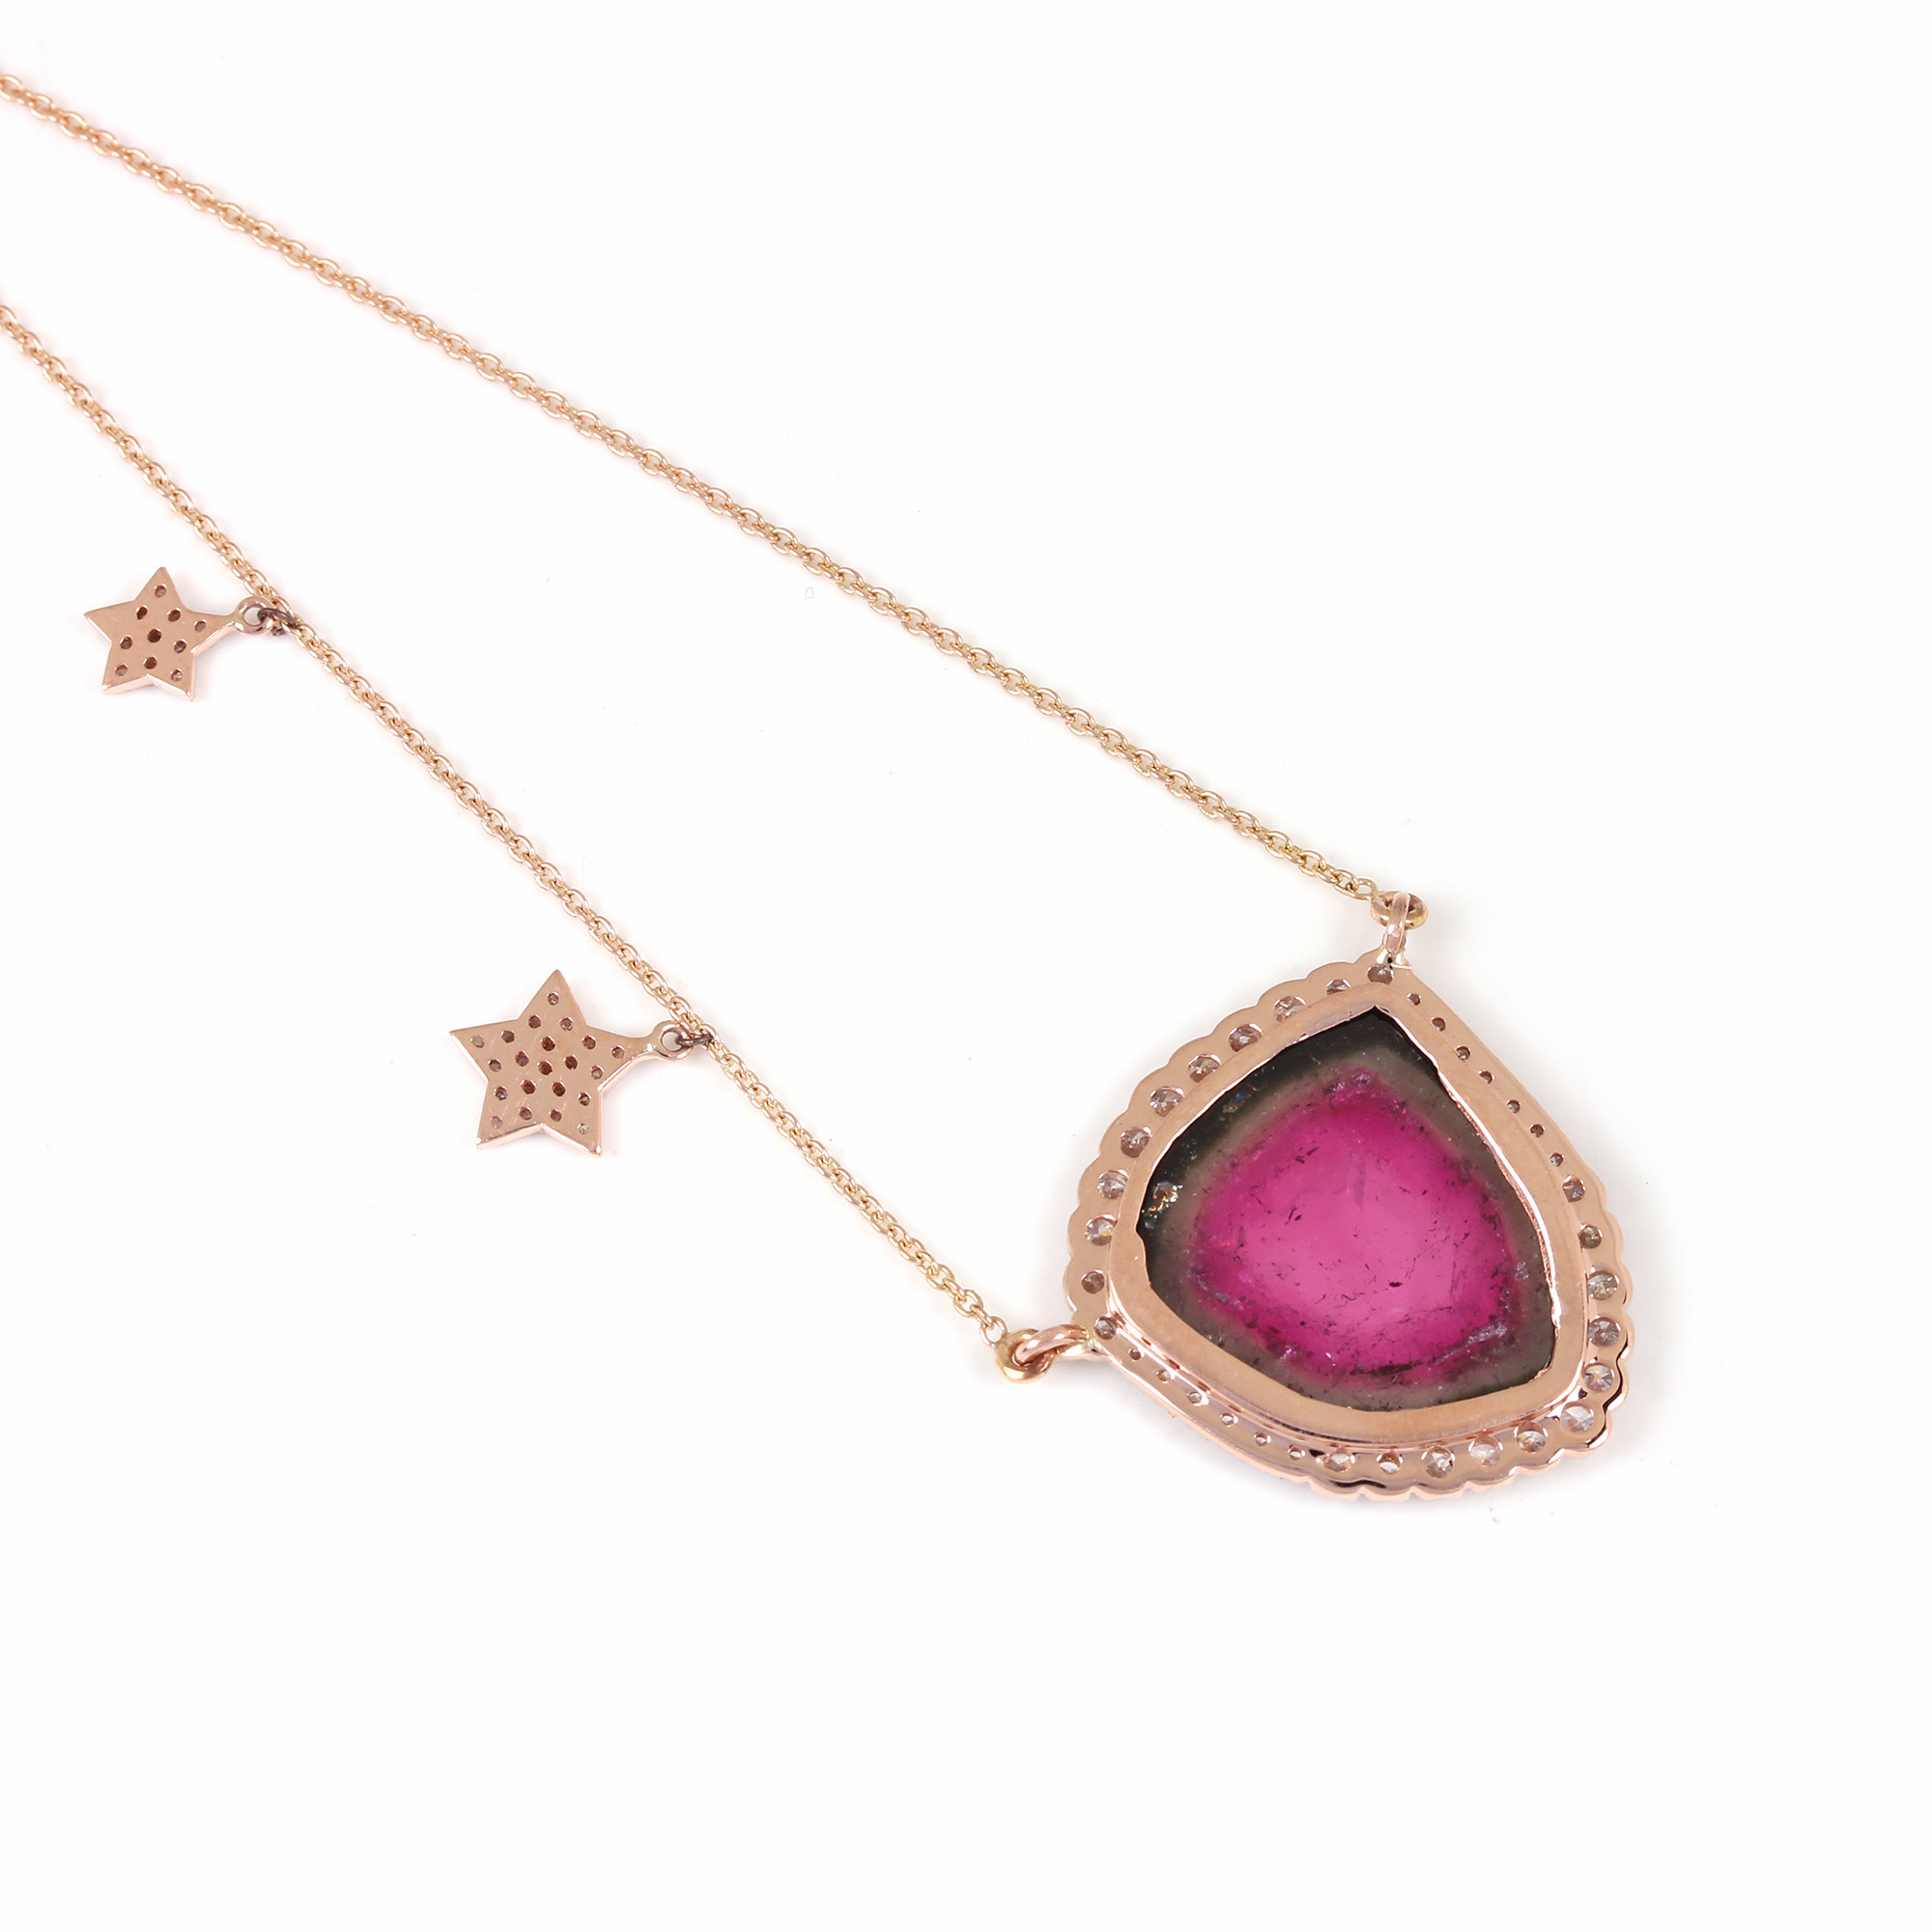 Tourmaline Pave Diamond Pendant Chain Necklace 14K Solid Gold Jewelry